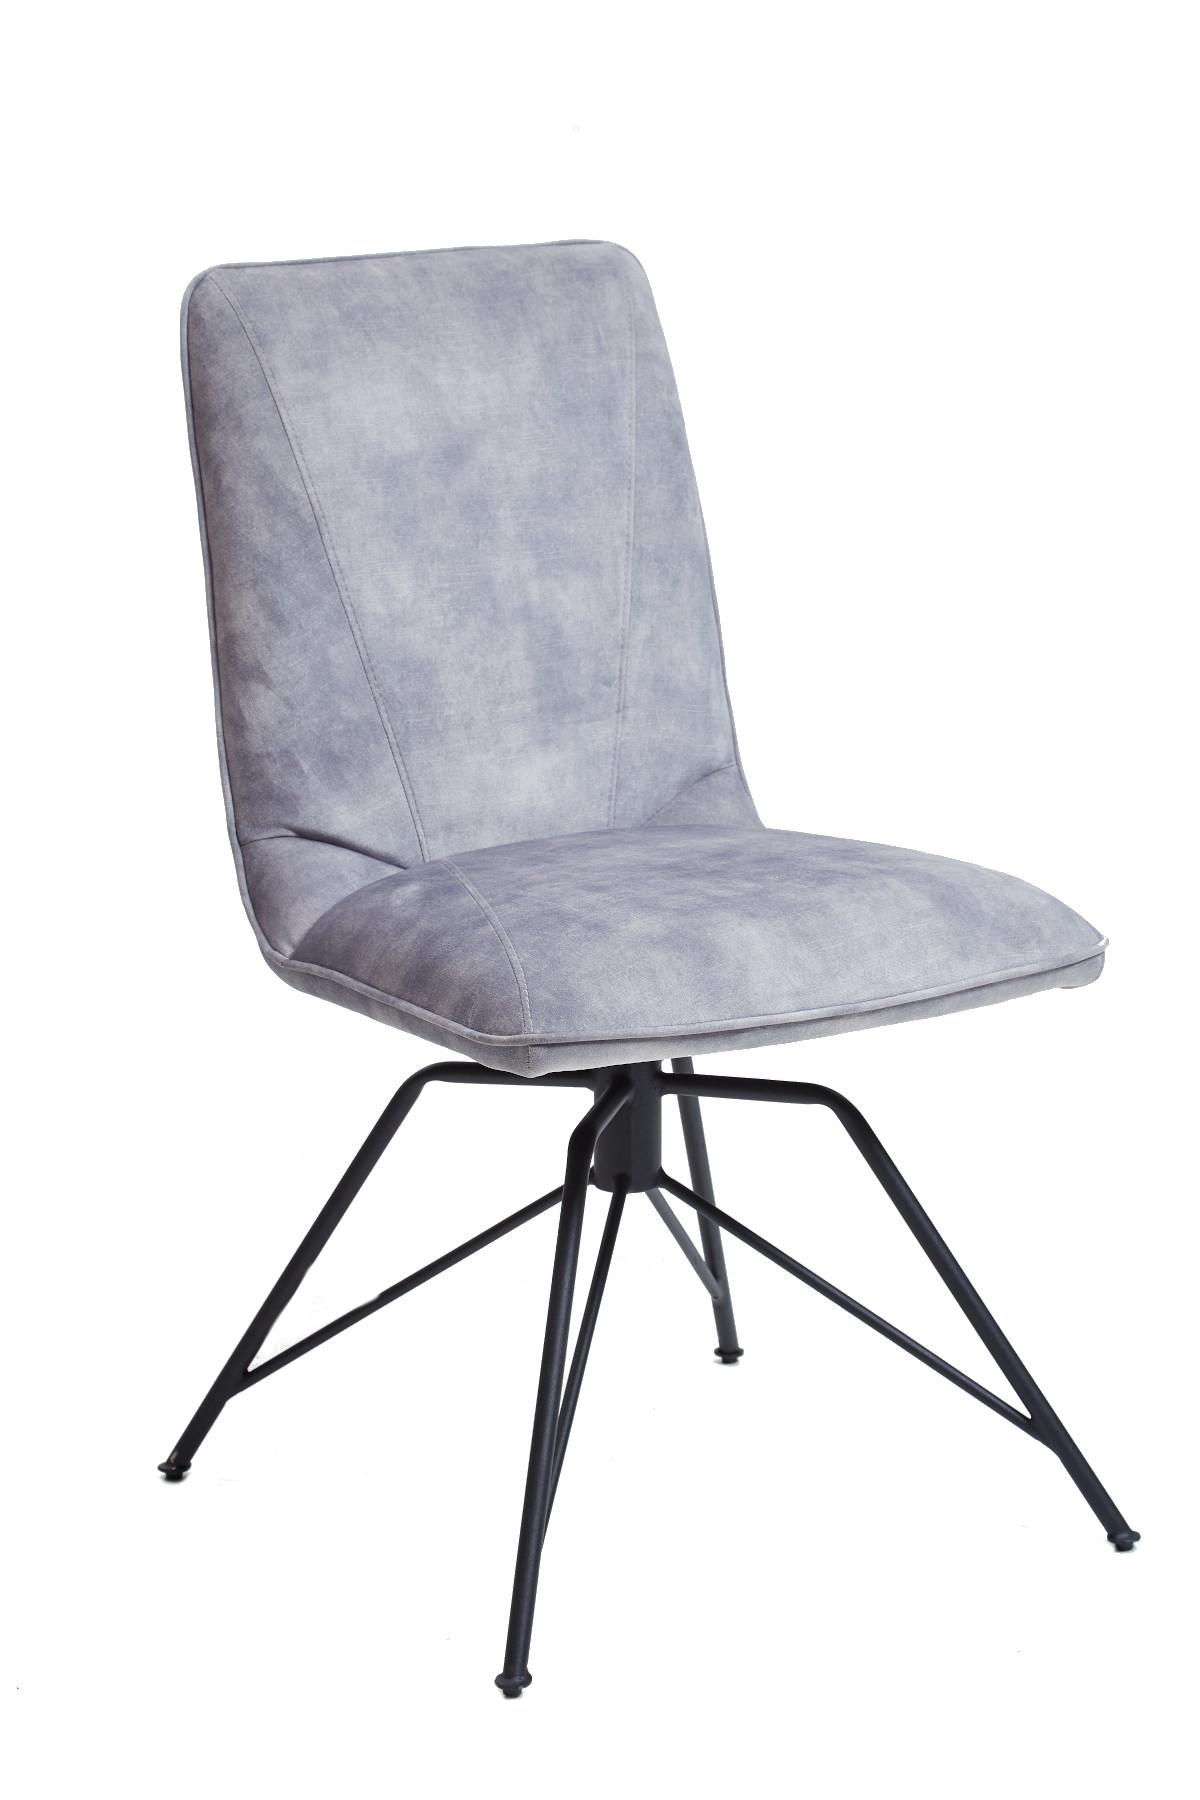 Carter Grey Dining Chair